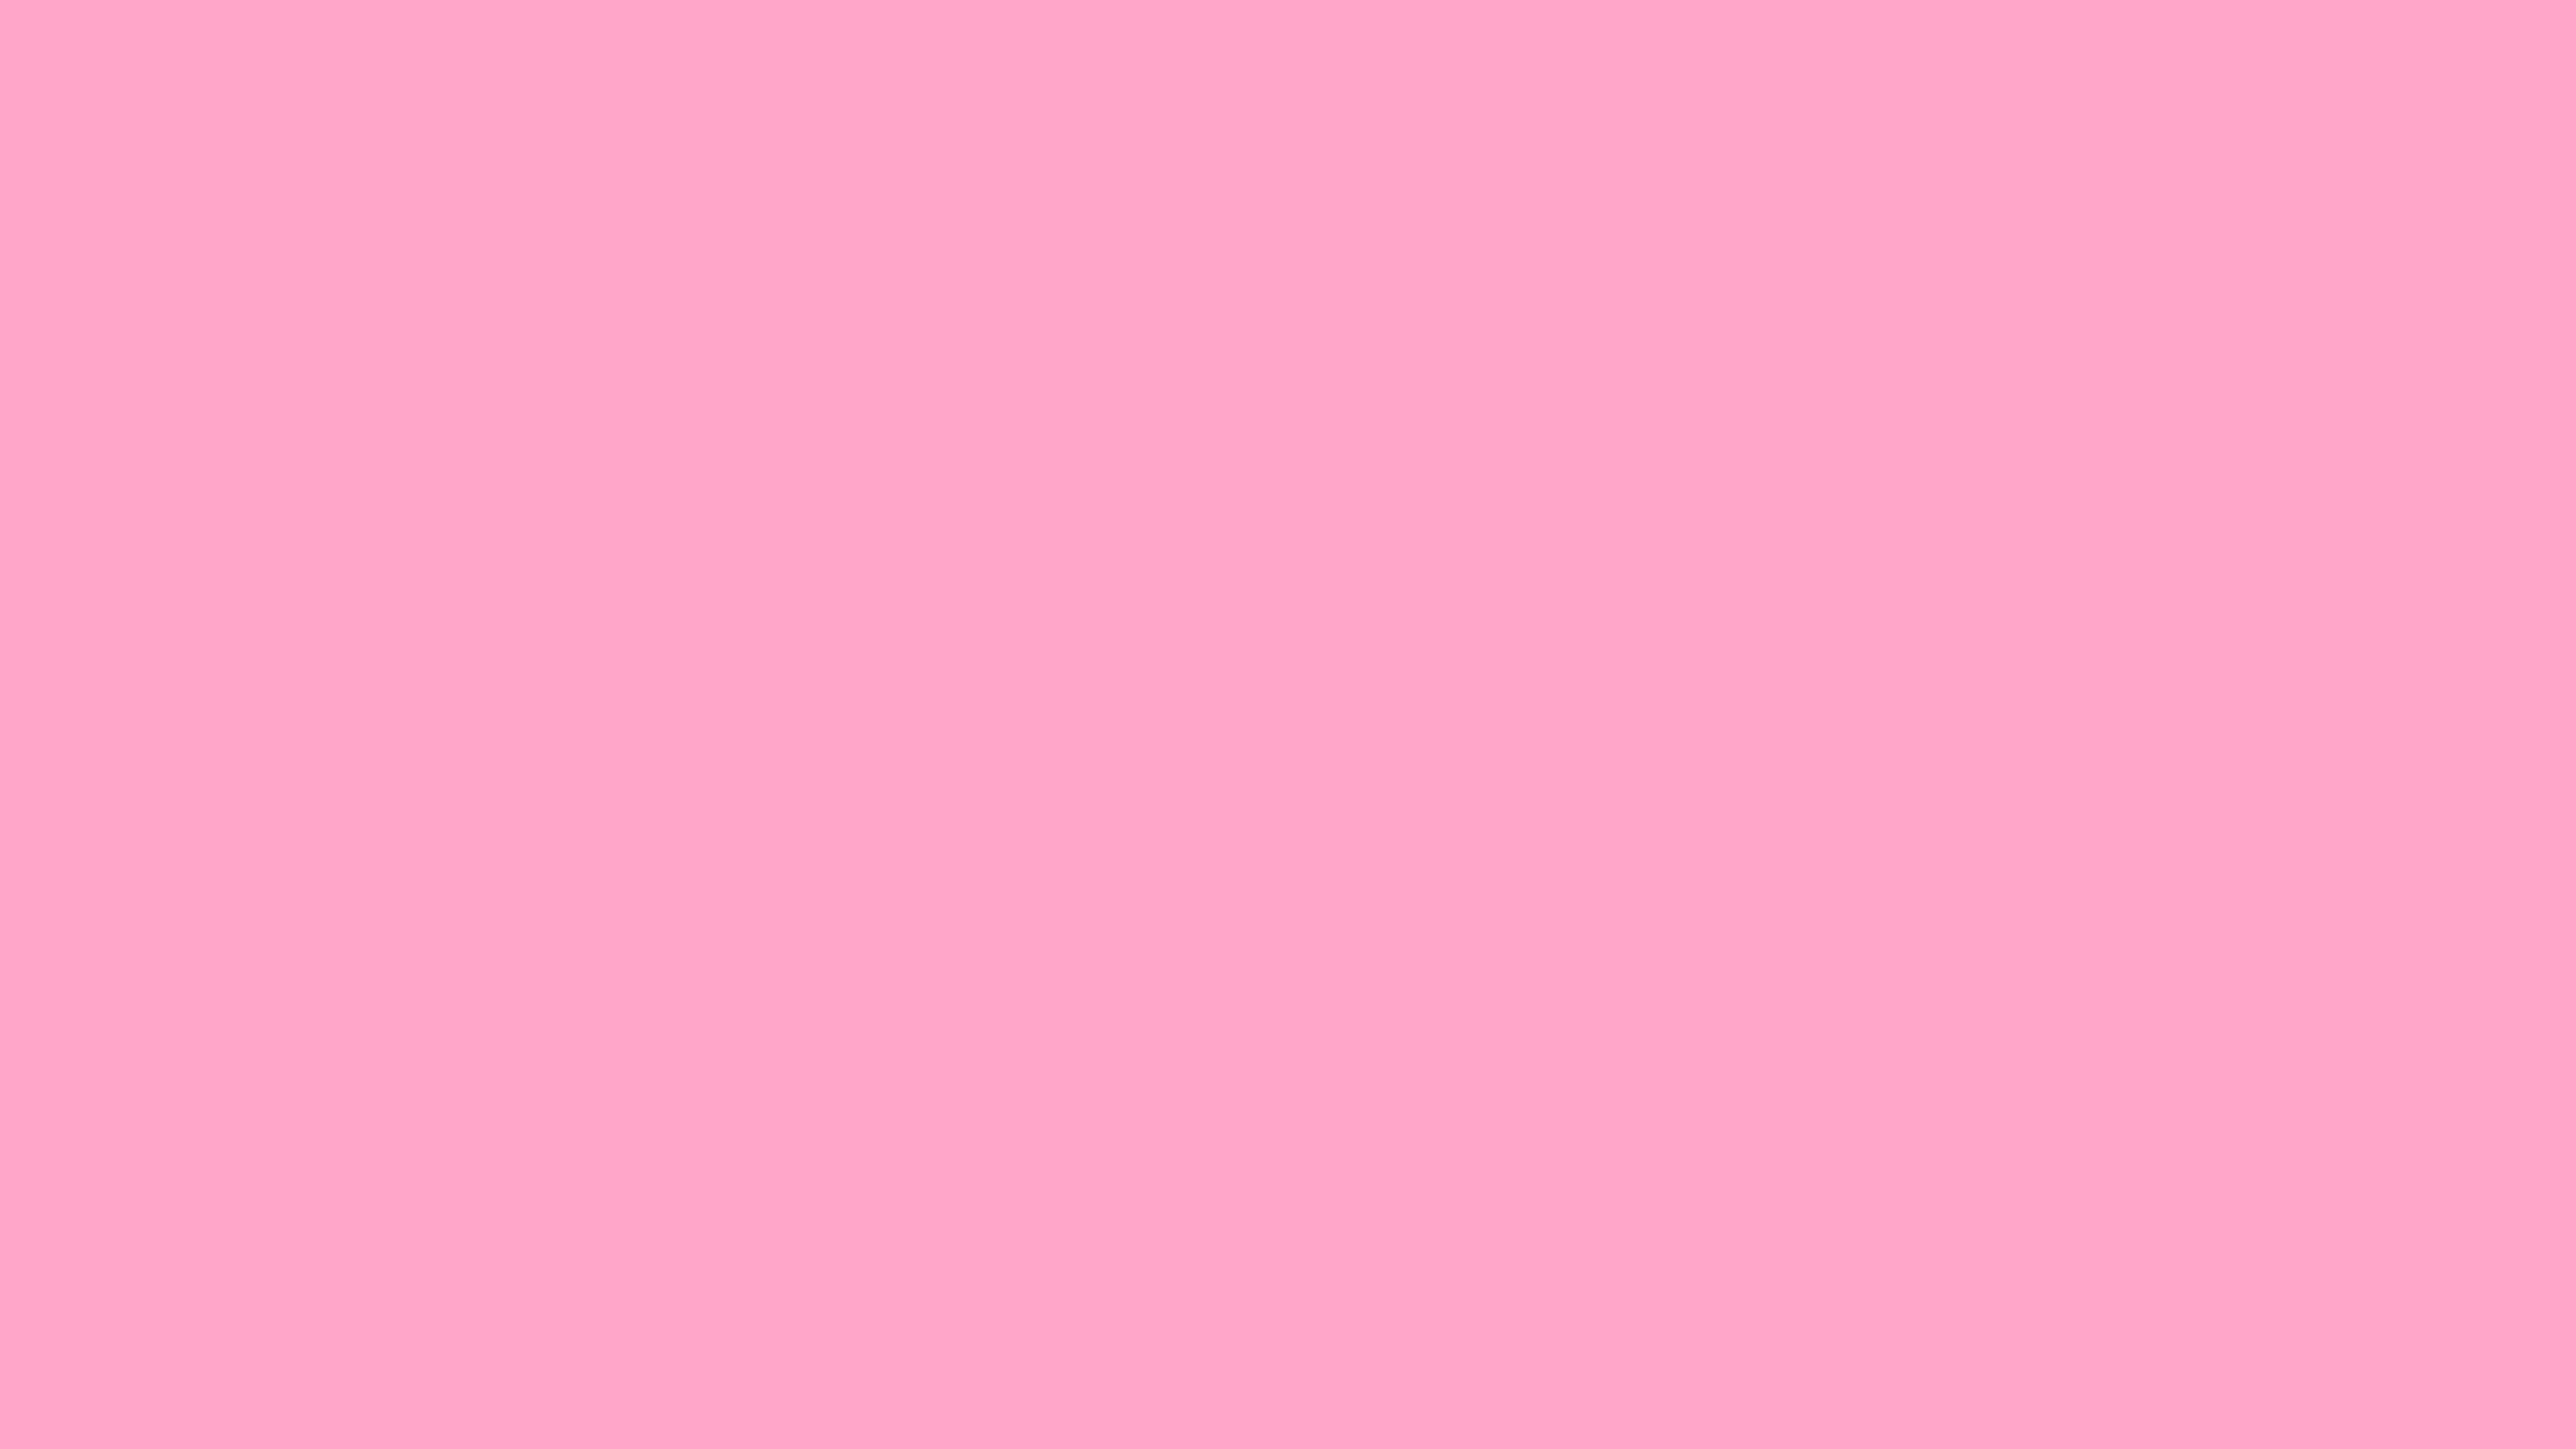 5120x2880 Carnation Pink Solid Color Background